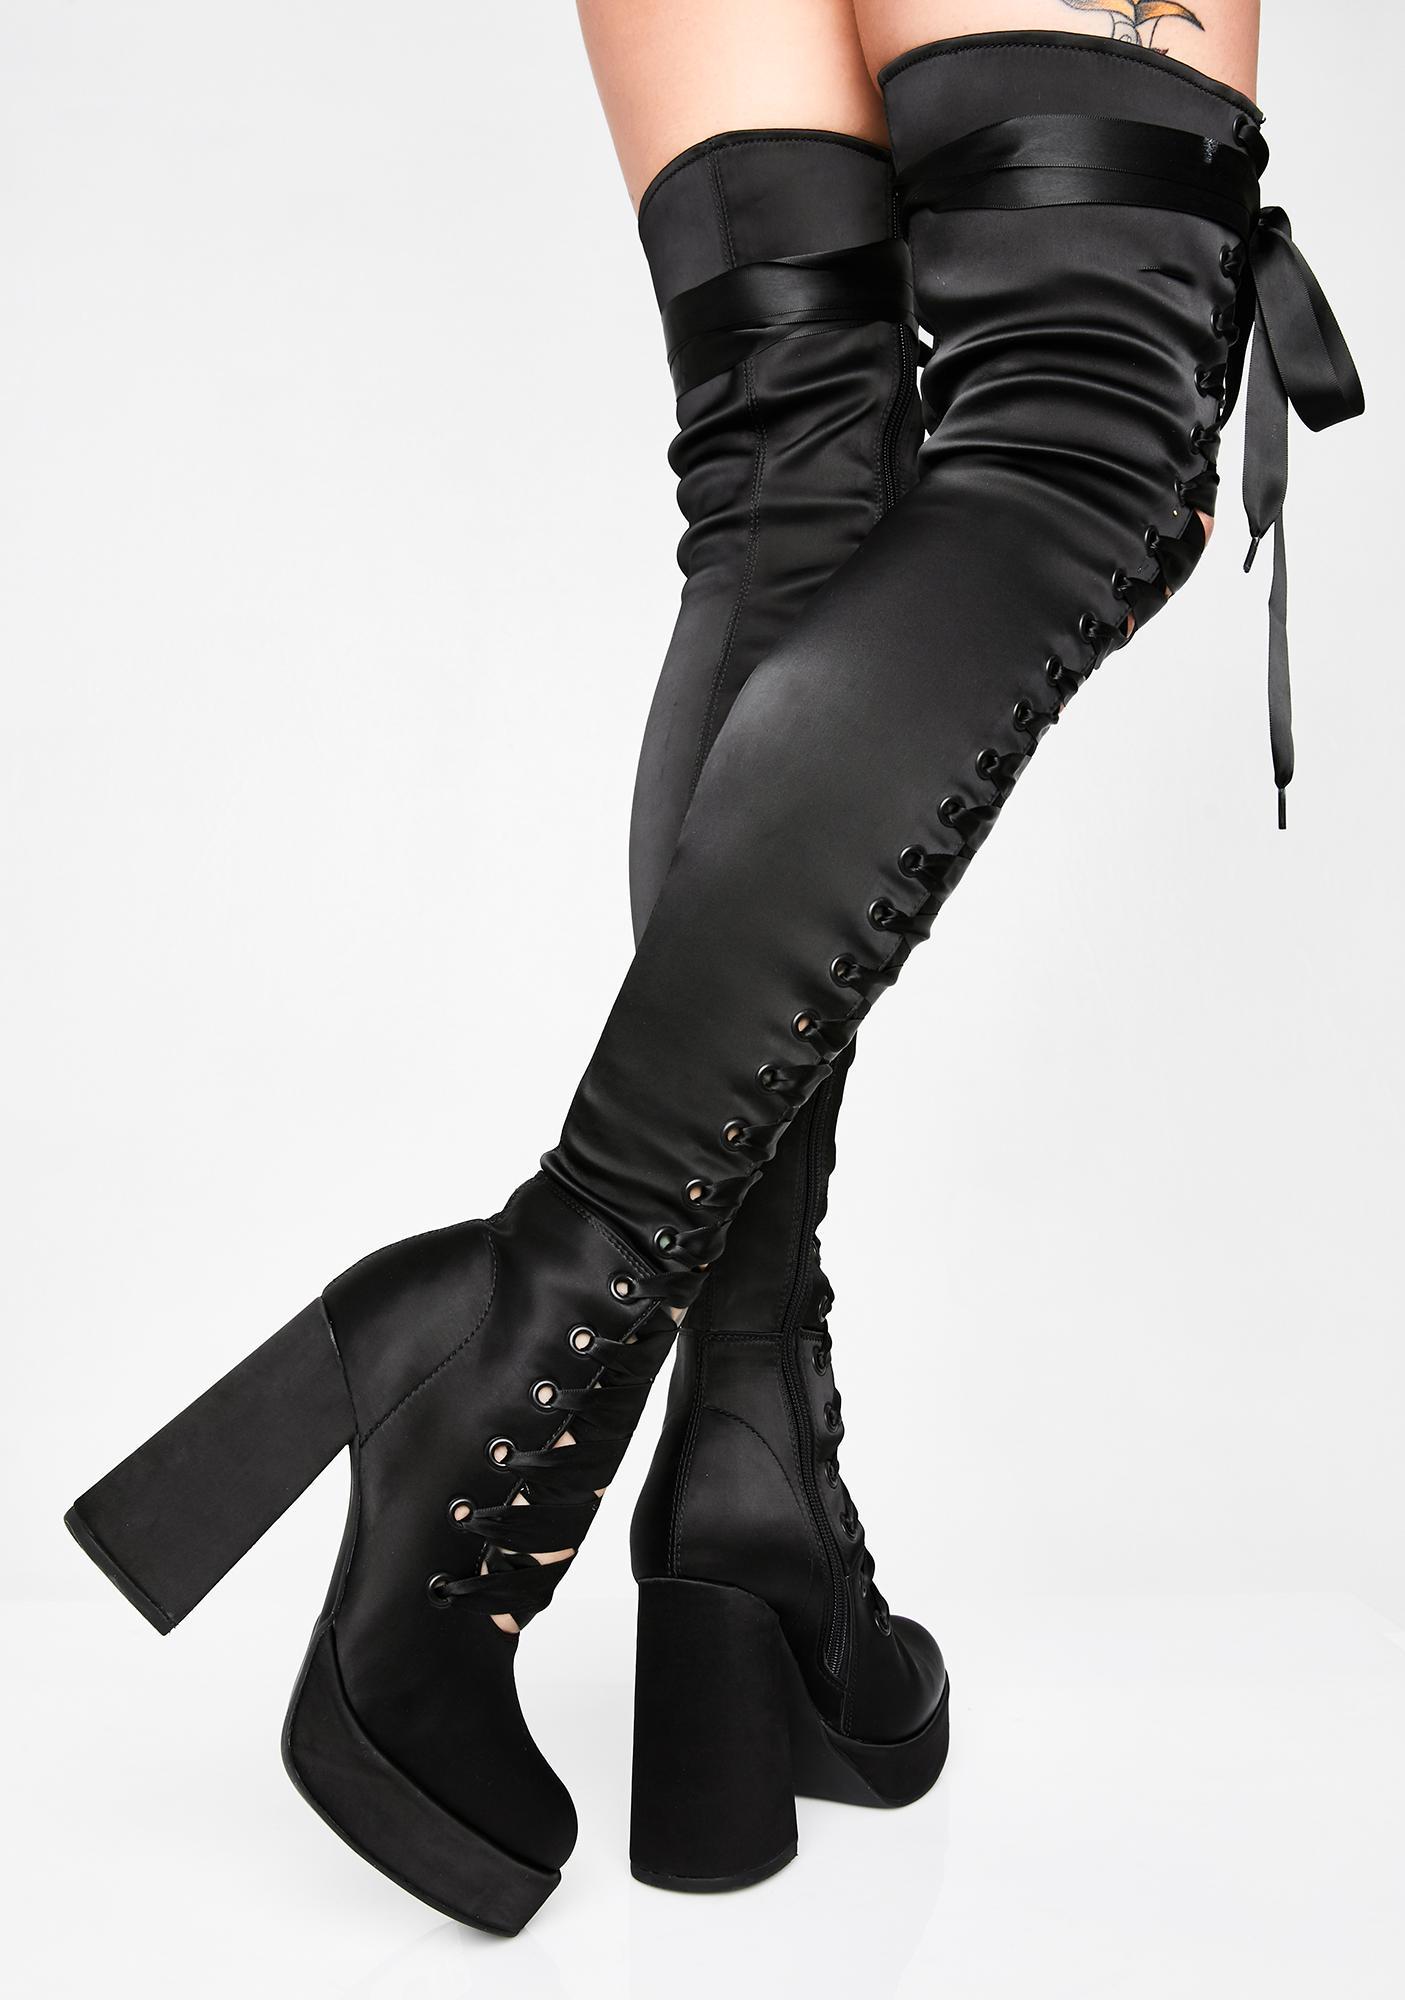 Sugar Thrillz Luna Dollhouse Diva Thigh High Boots